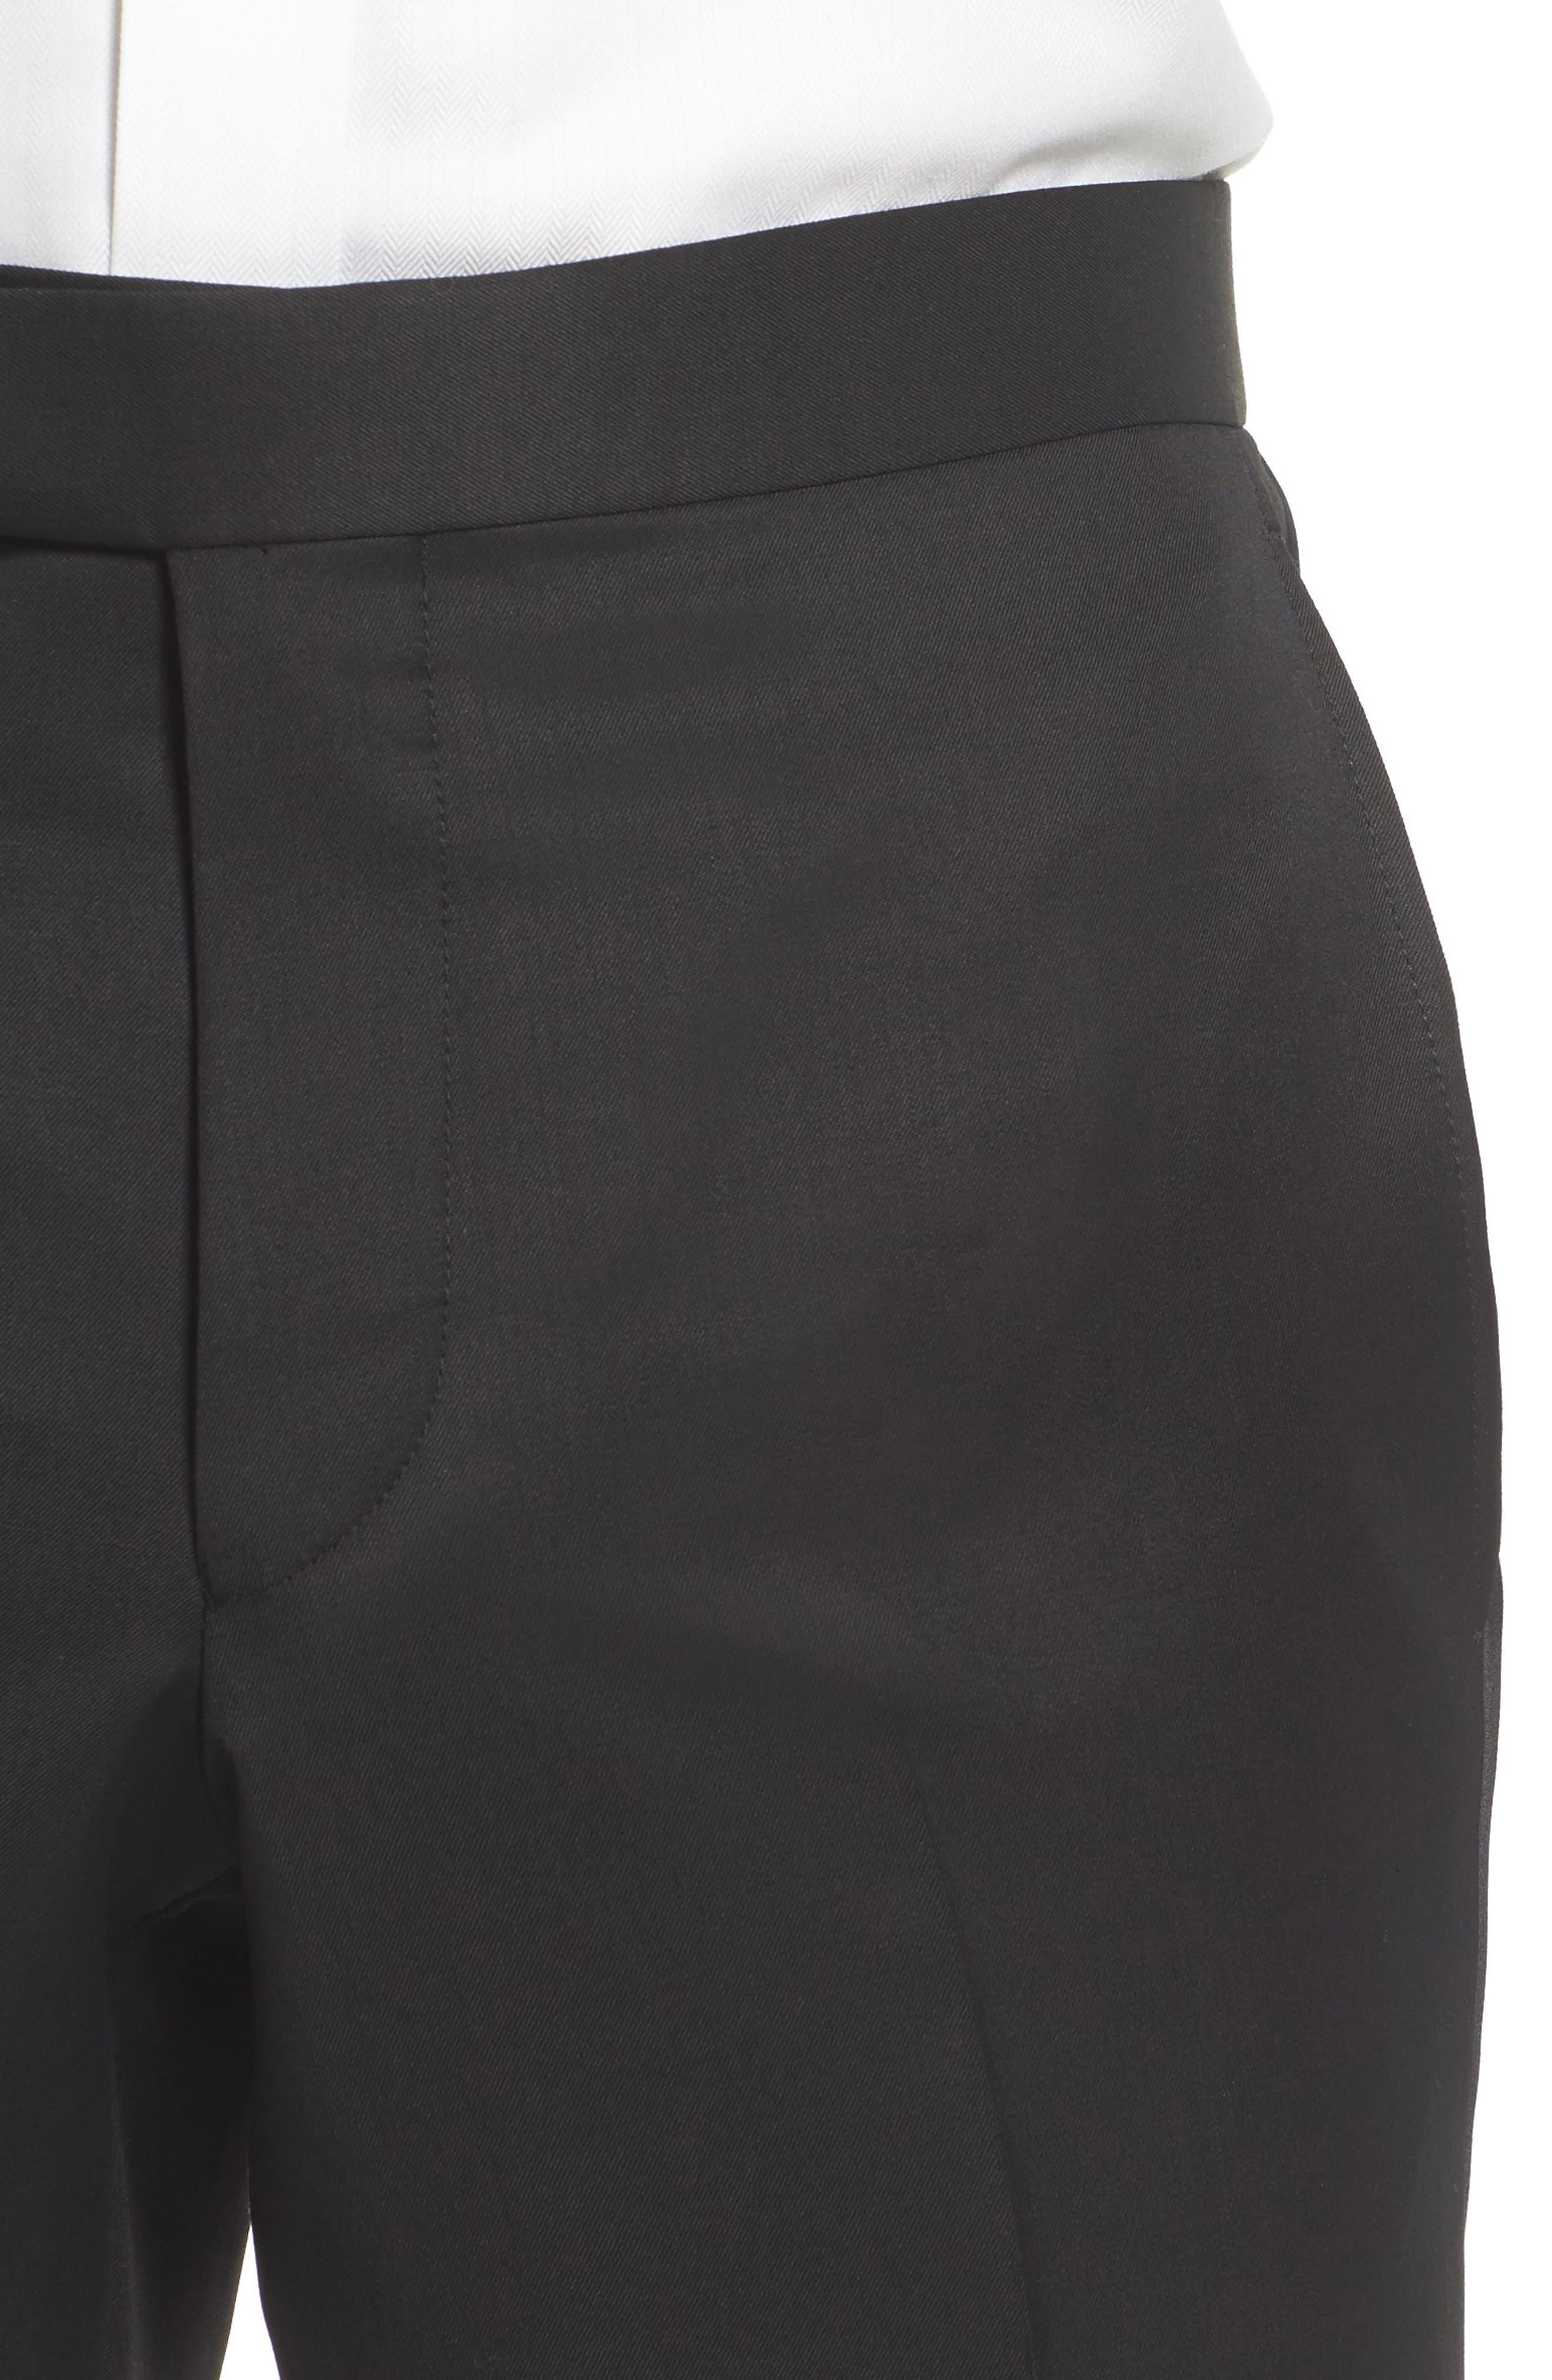 Josh Flat Front Wool & Mohair Tuxedo Pants,                             Alternate thumbnail 5, color,                             BLACK